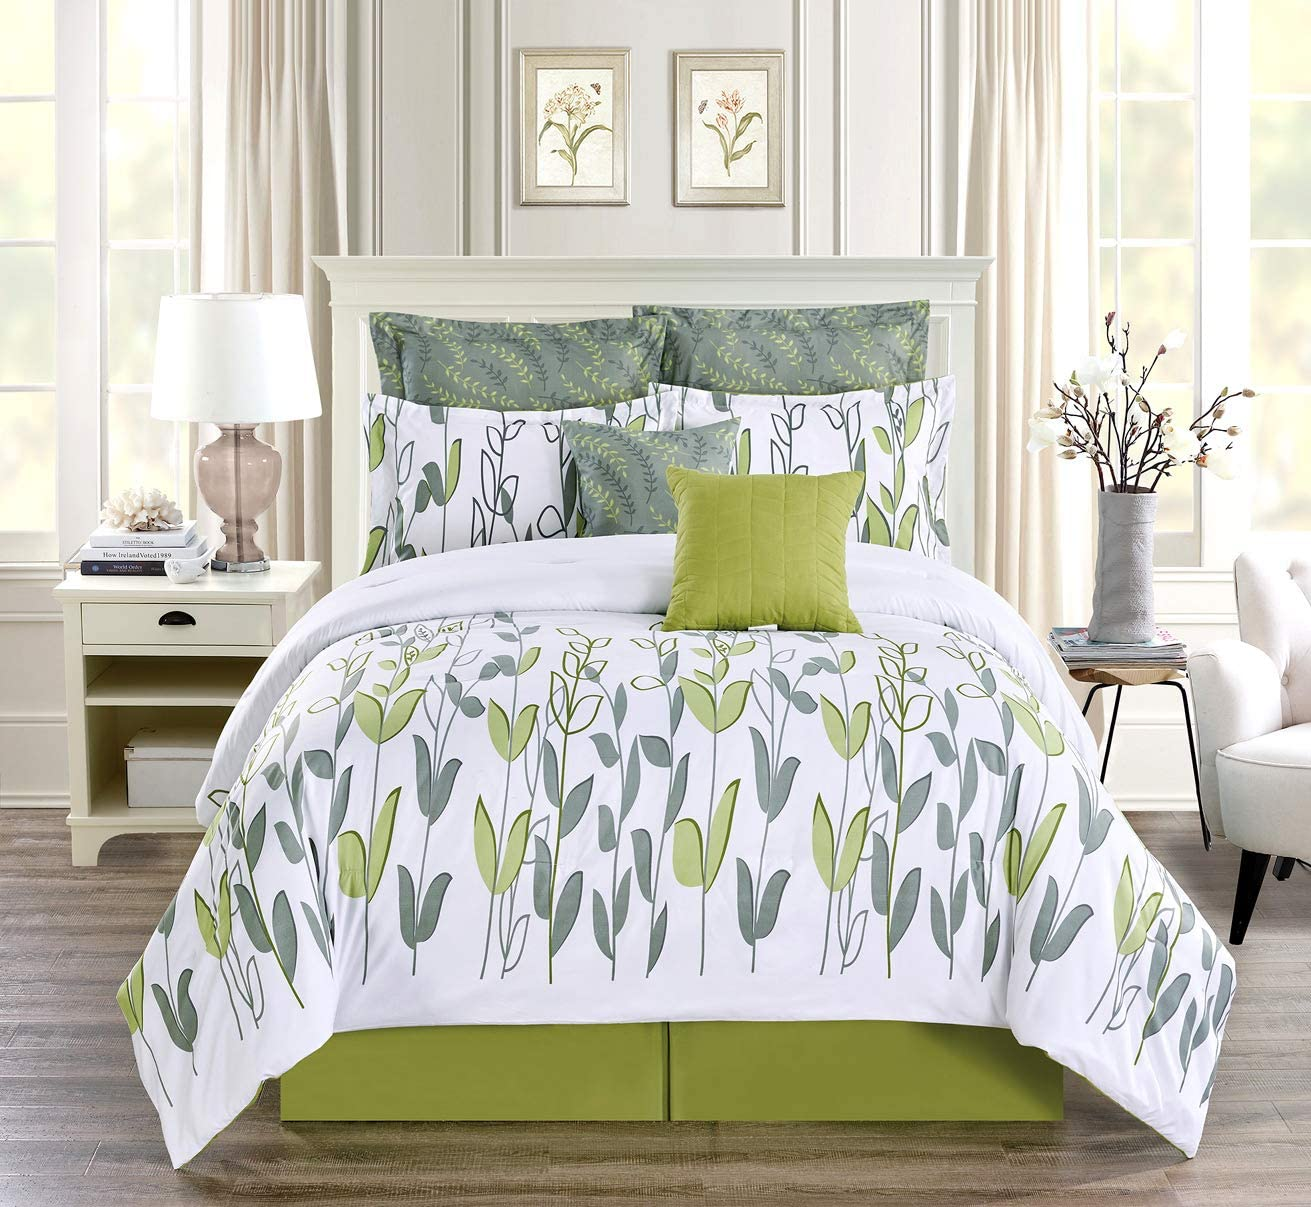 8-Piece Full Size Vine Print Luxury Allen Bedding Sage Green/Grey White Comforter Set Bed in a Bag